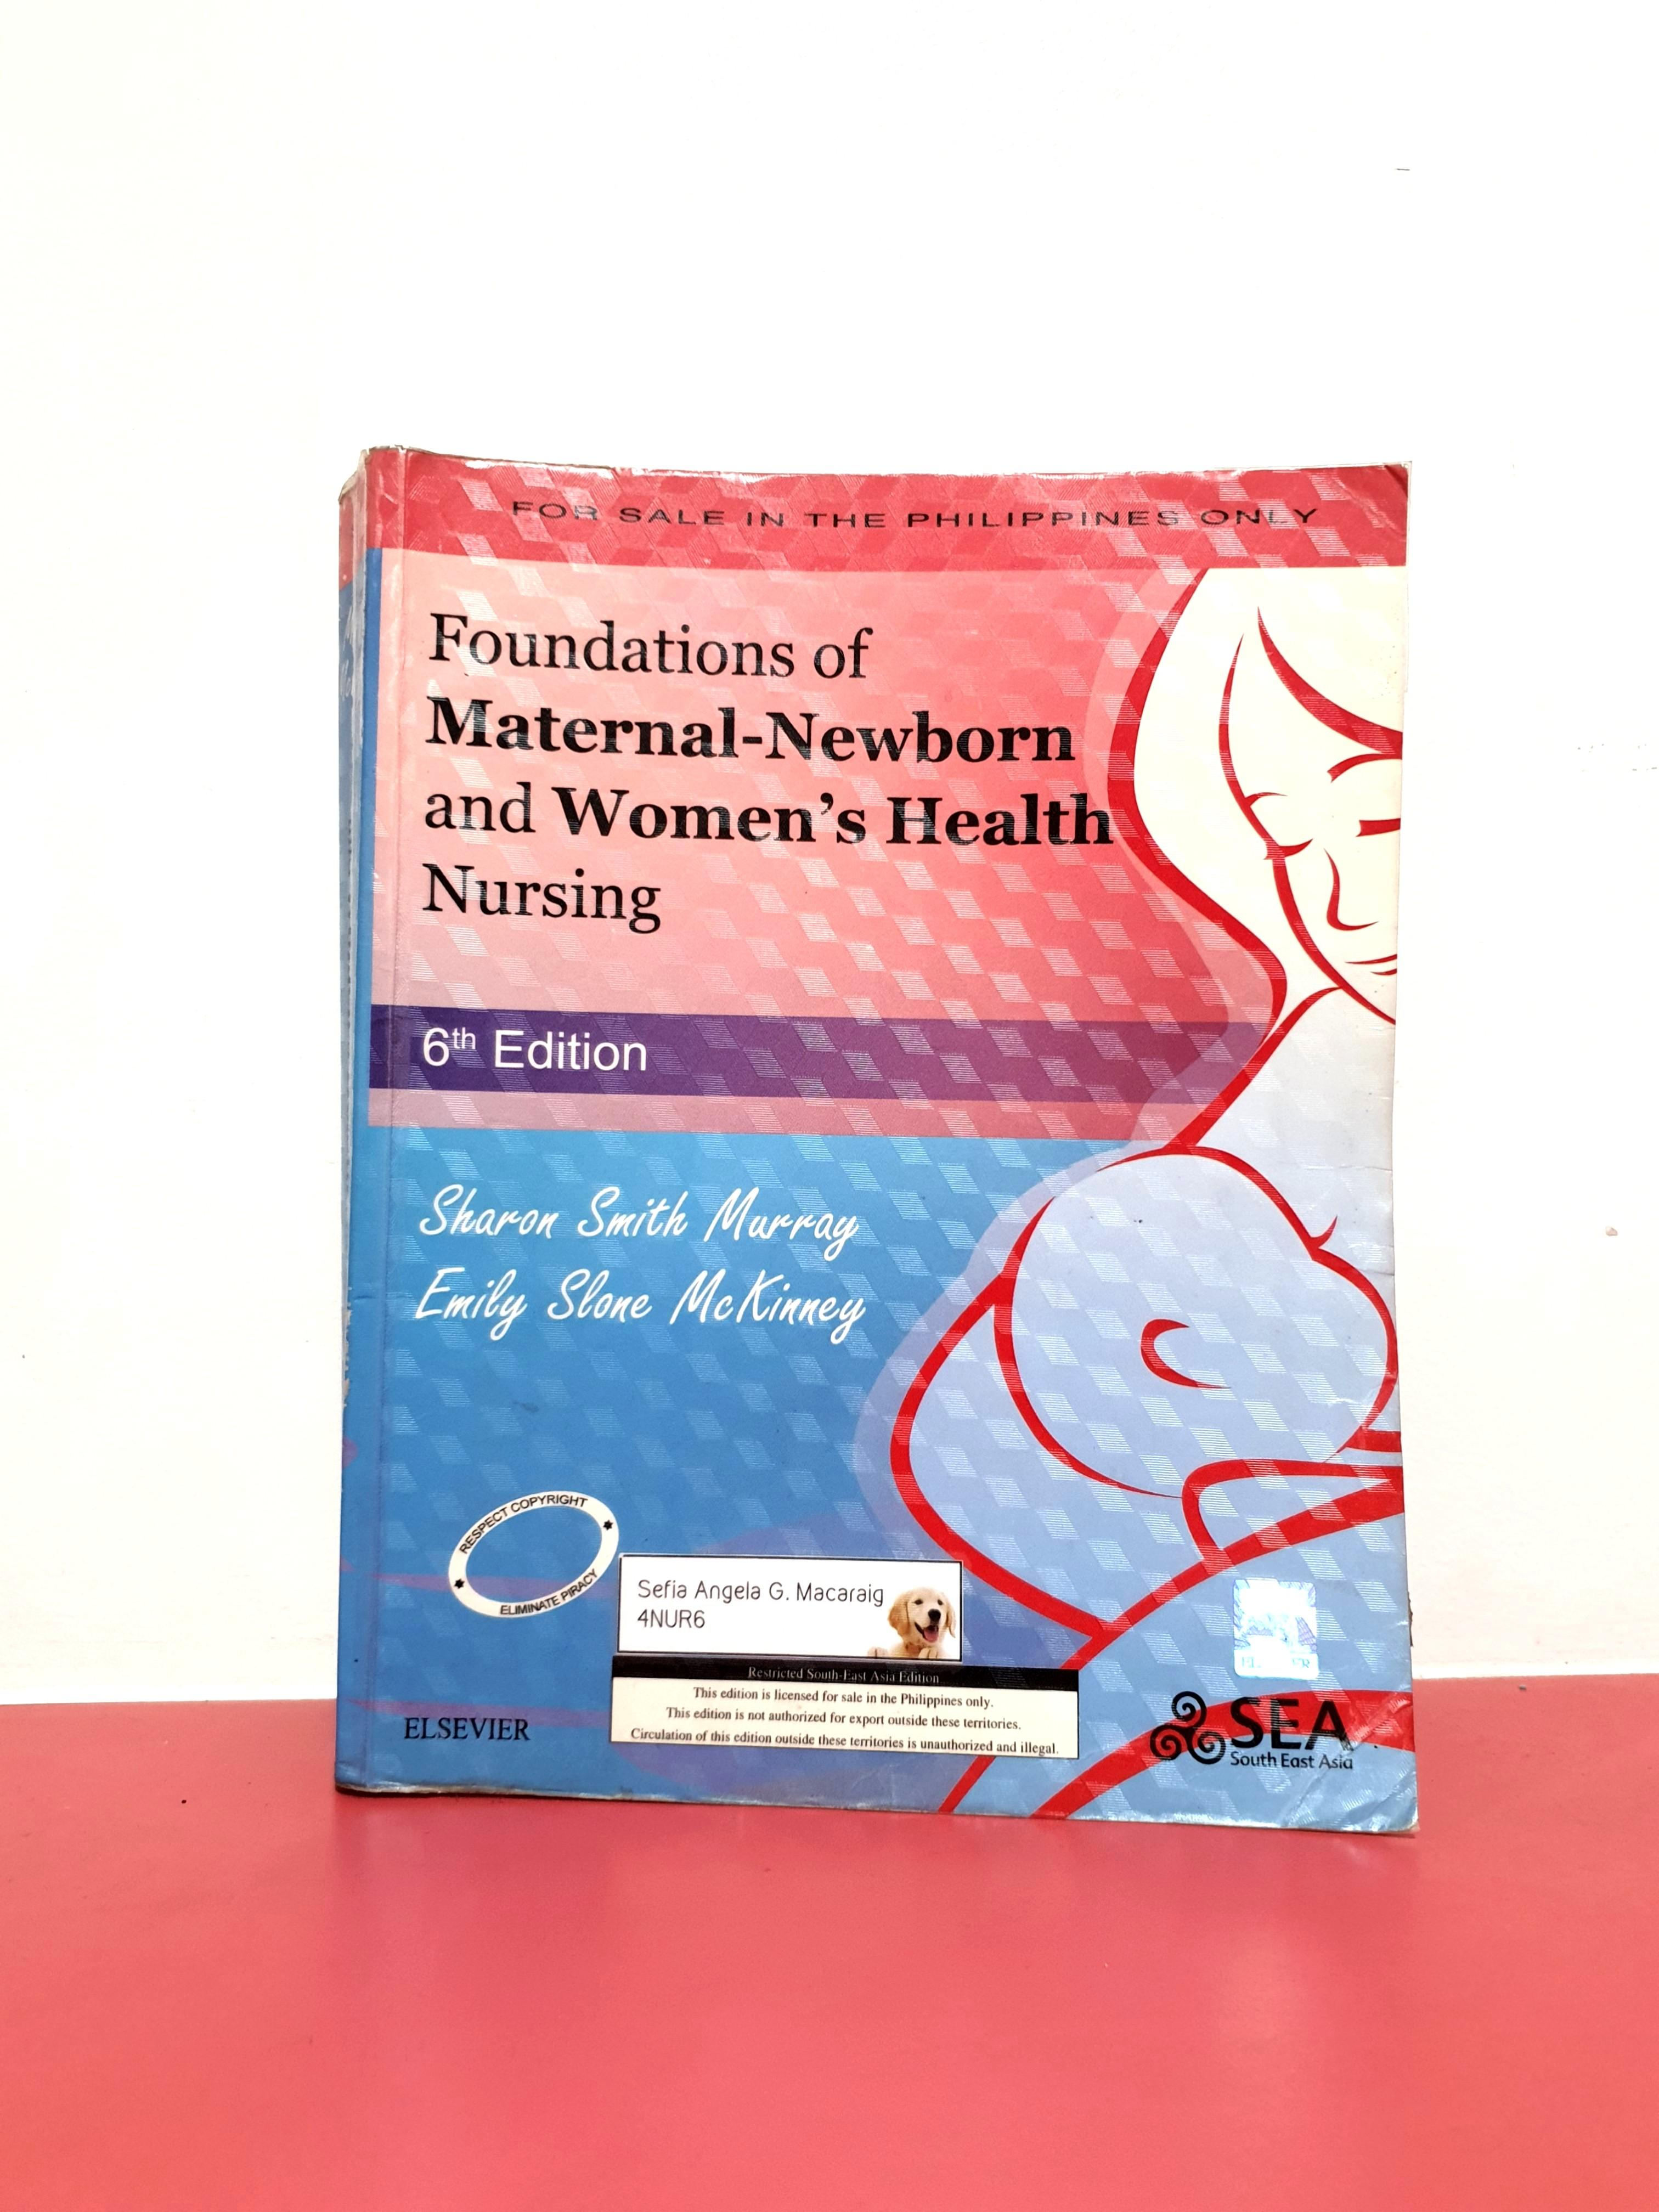 Foundations of Maternal-Newborn and Women's Health Nursing (6th ed.)